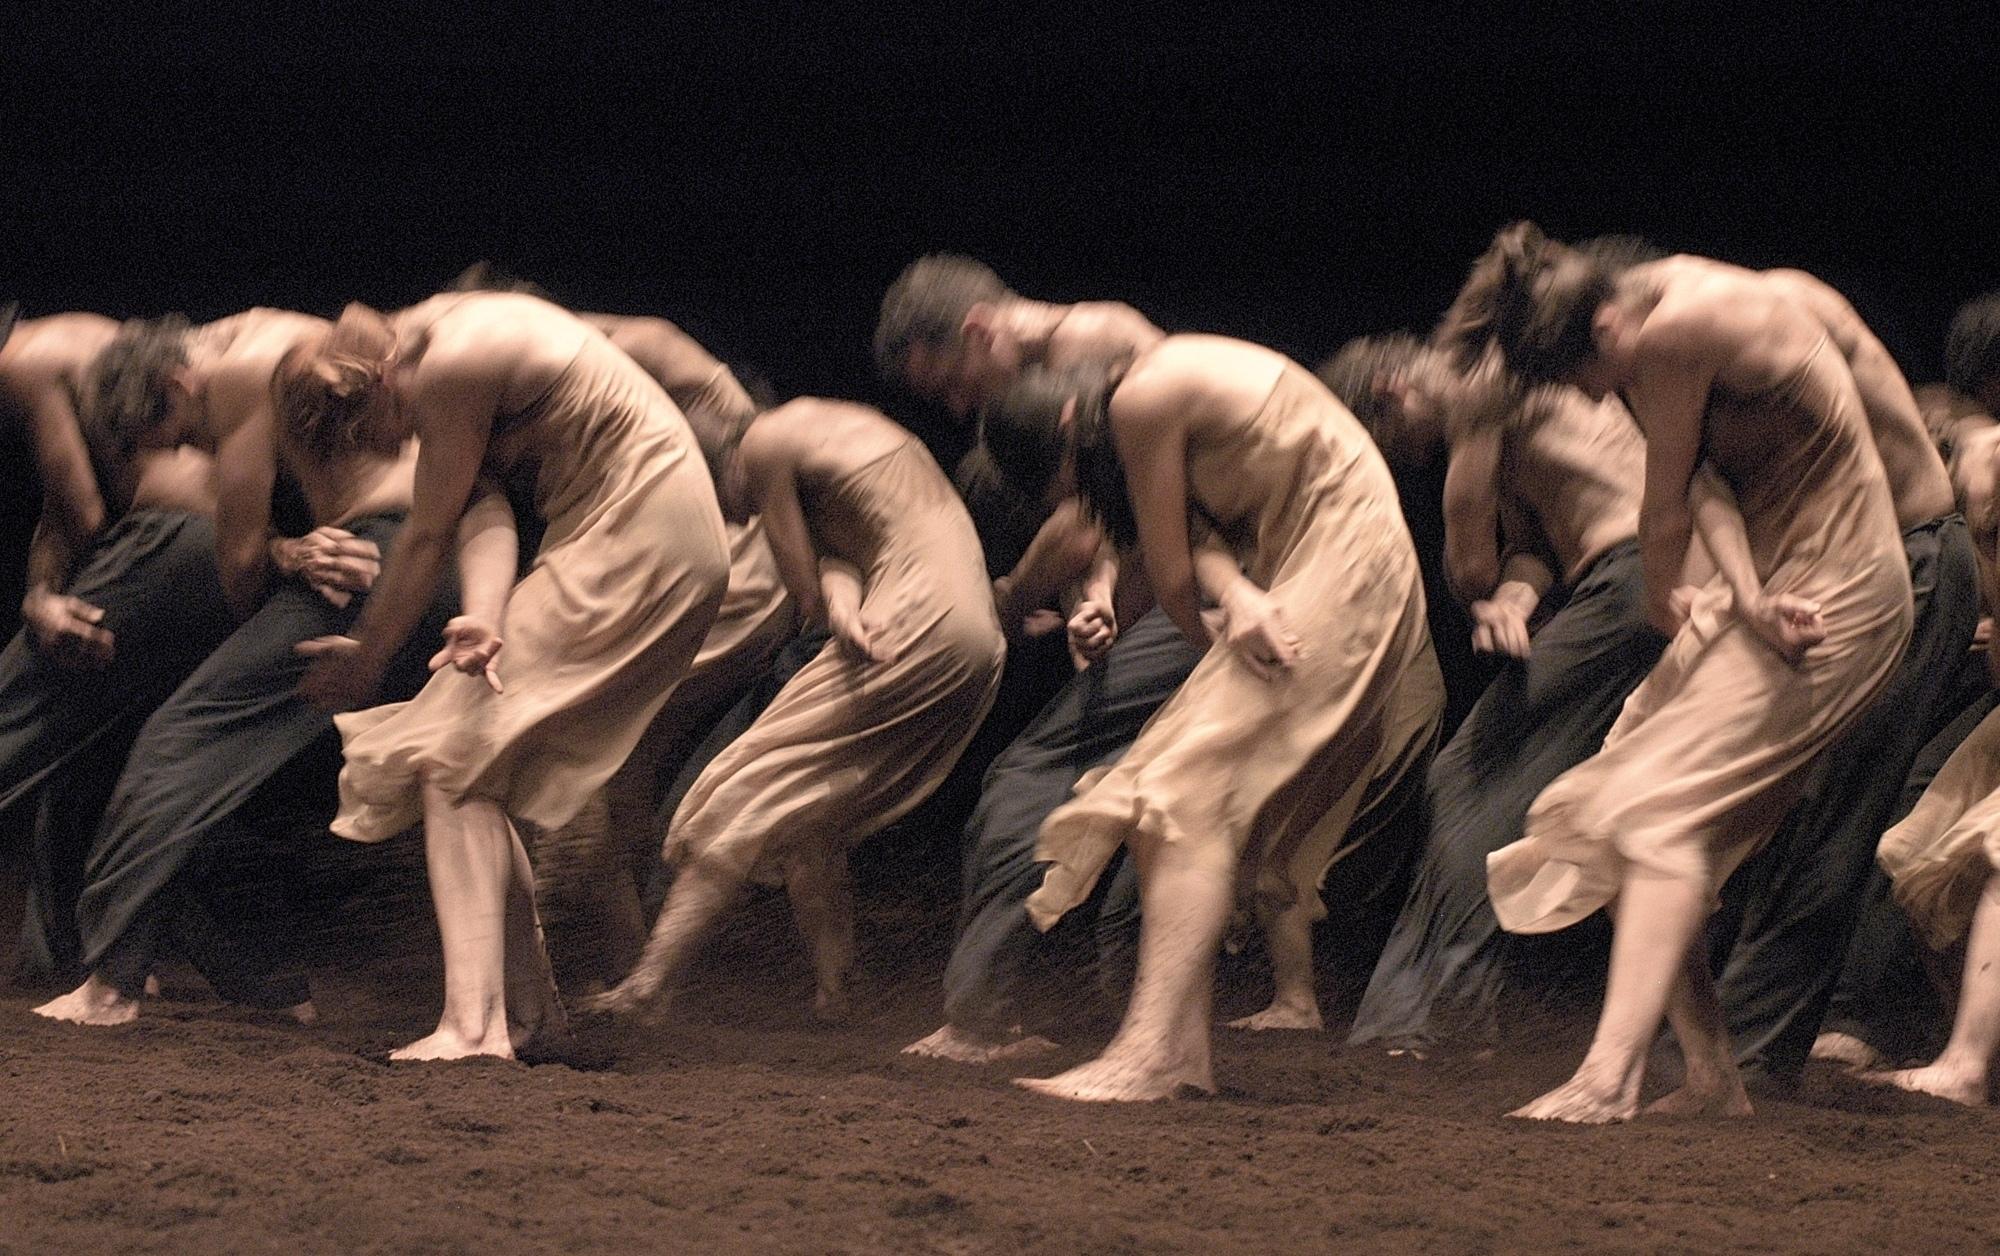 Le sacre du Printemps.Ensemble.(c)foto ulli weiss.jpg